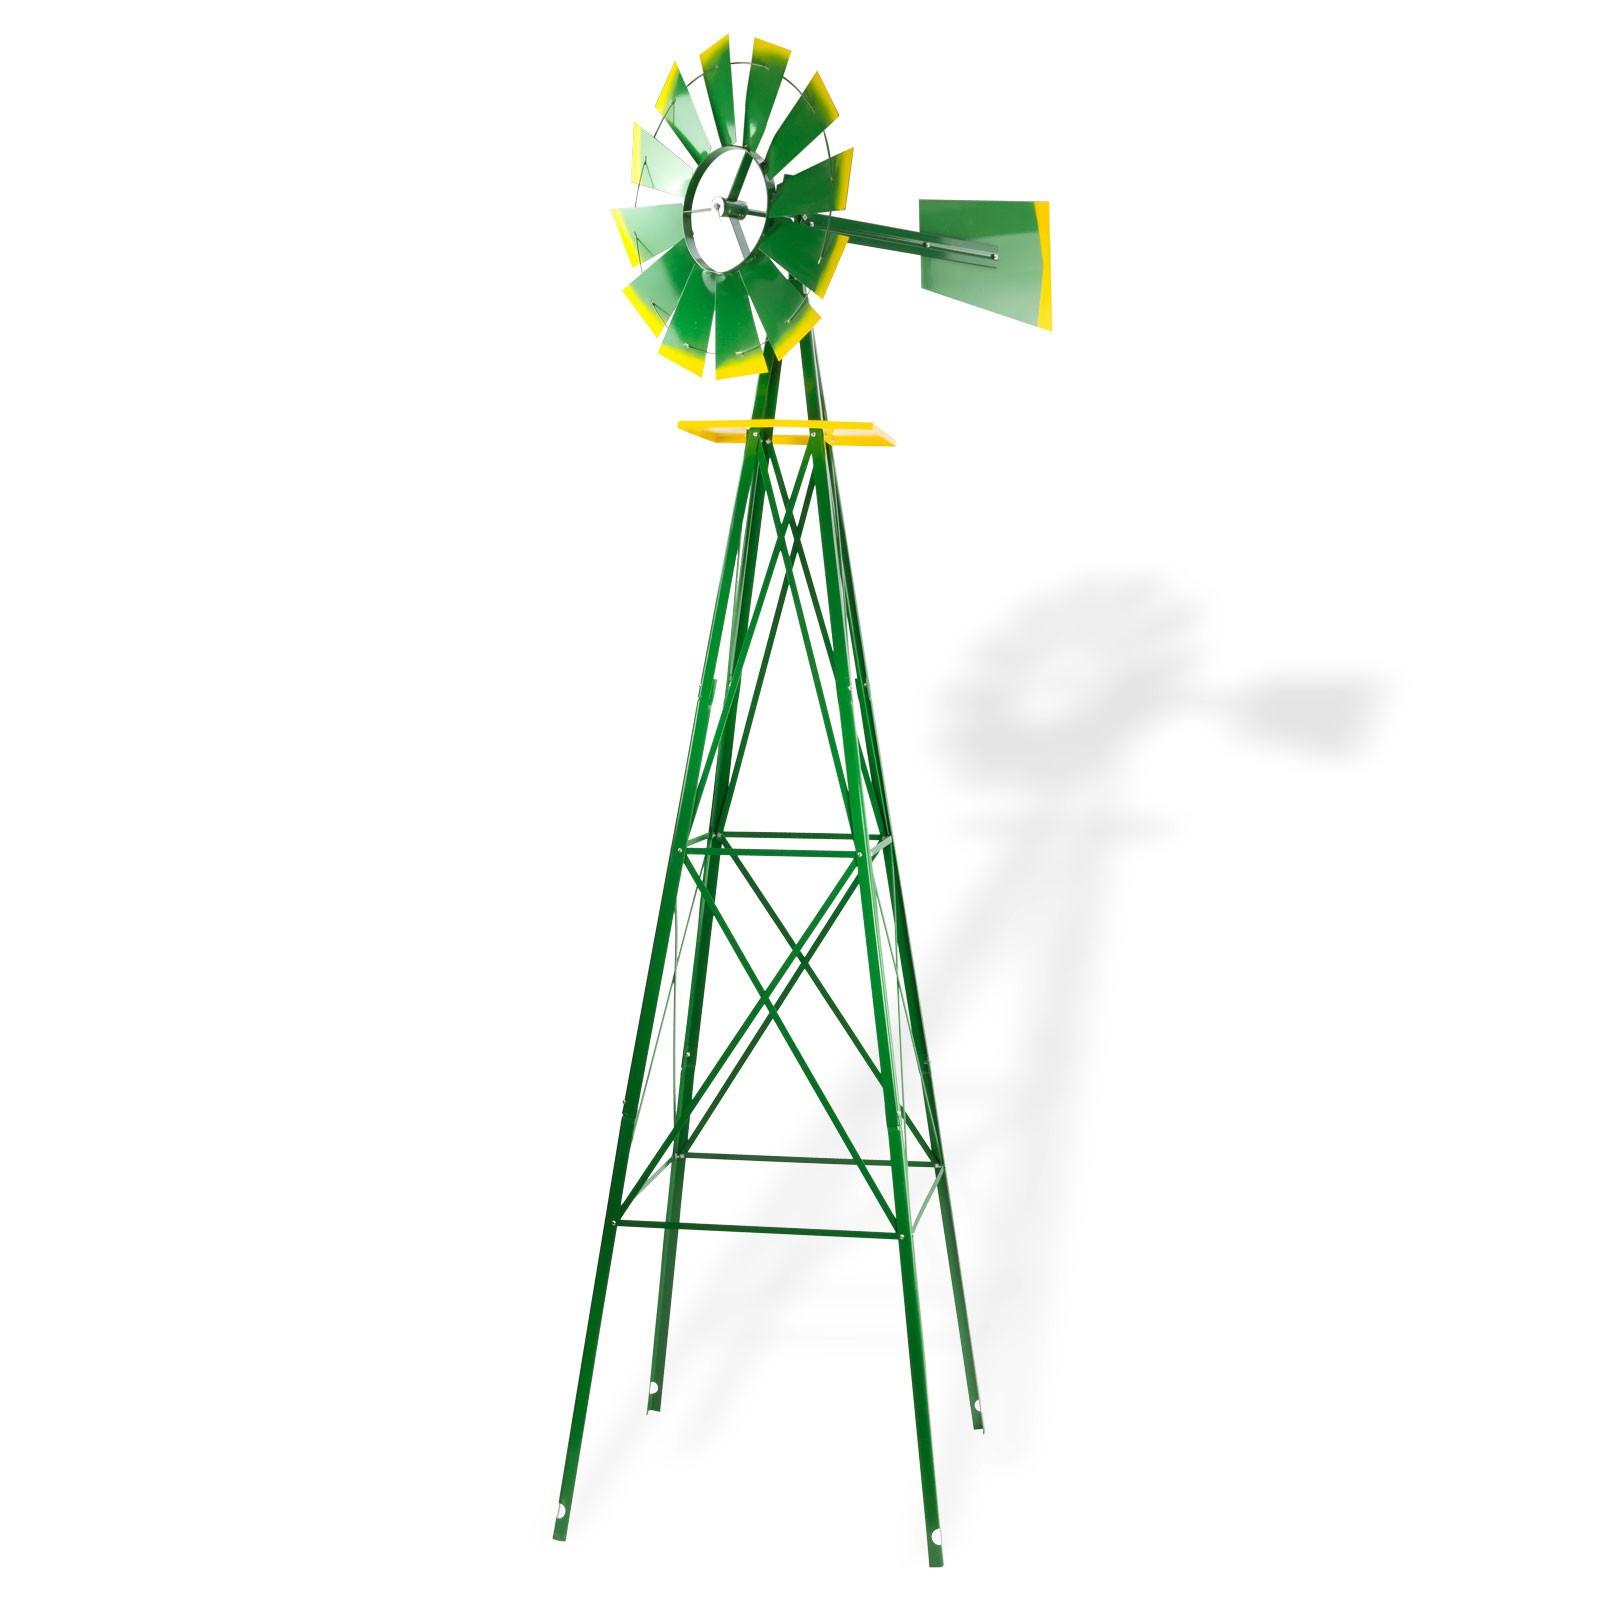 Windmühle Garten  Windrad Gartenwindrad Windmühle Deko Garten Windspiel ø